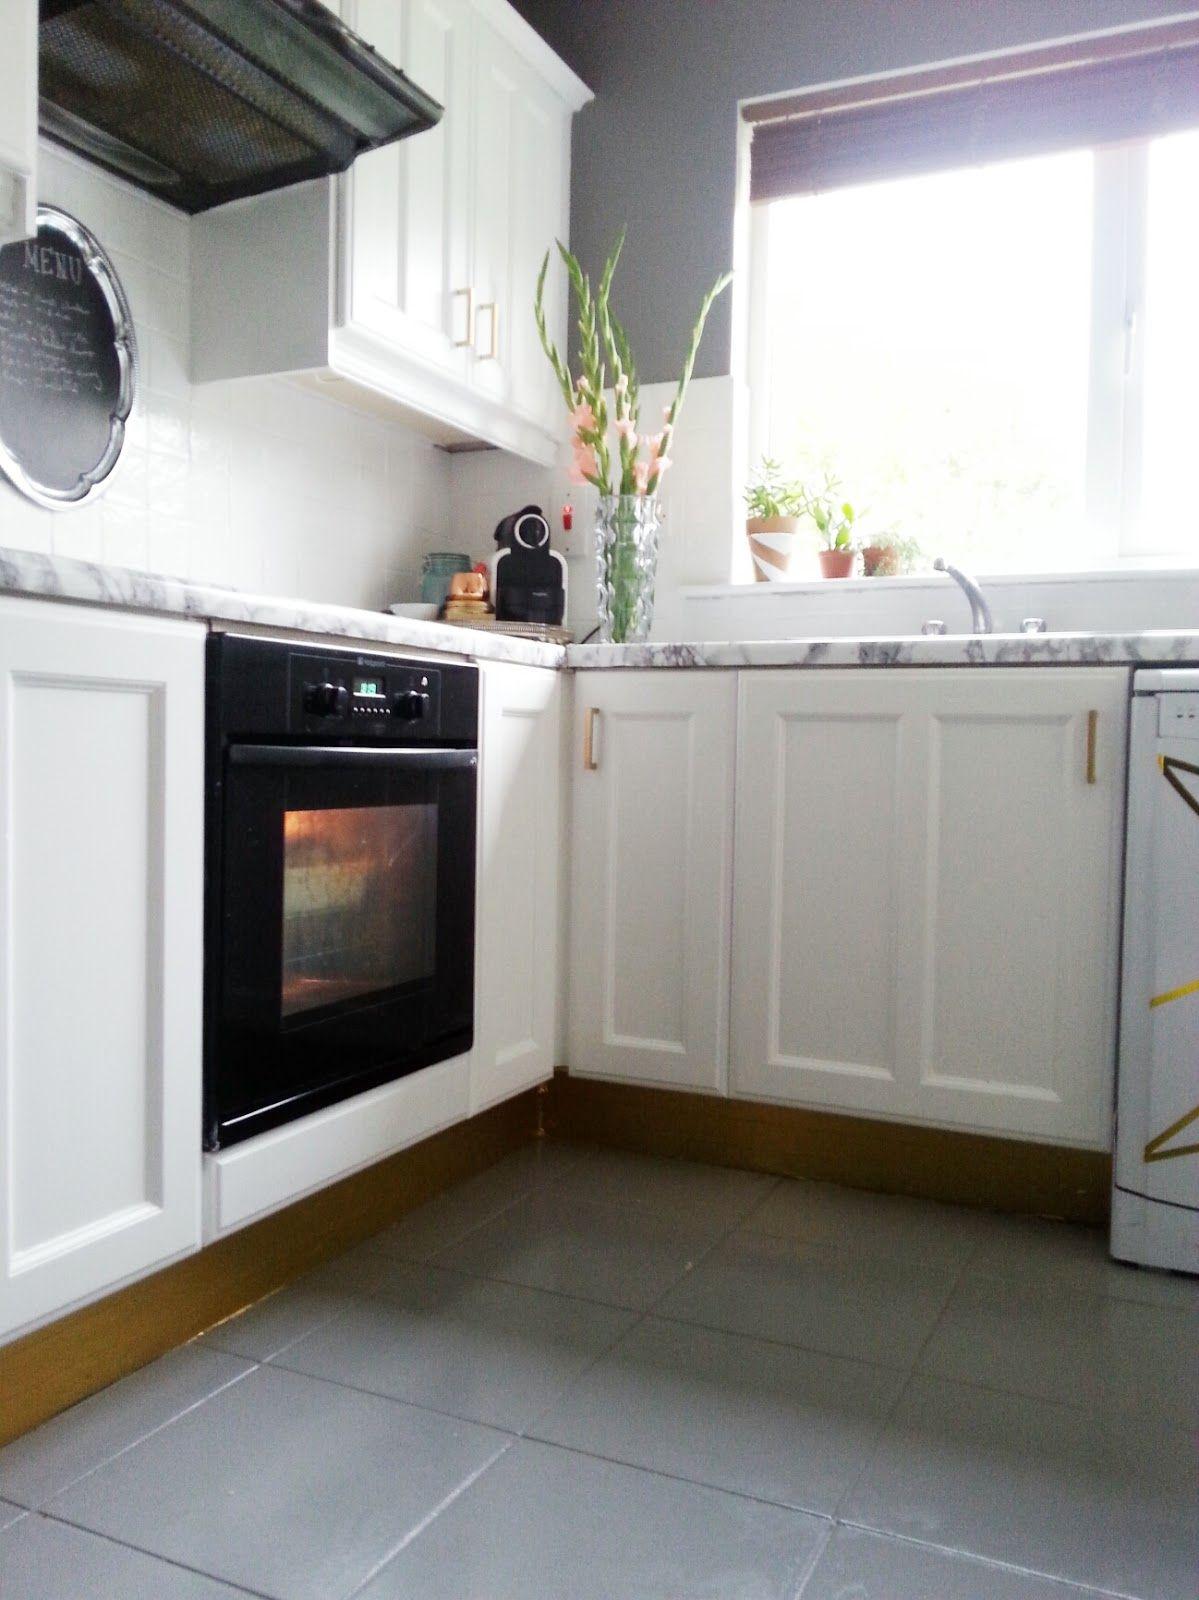 200 euro, one week, full kitchen makeover. Floor